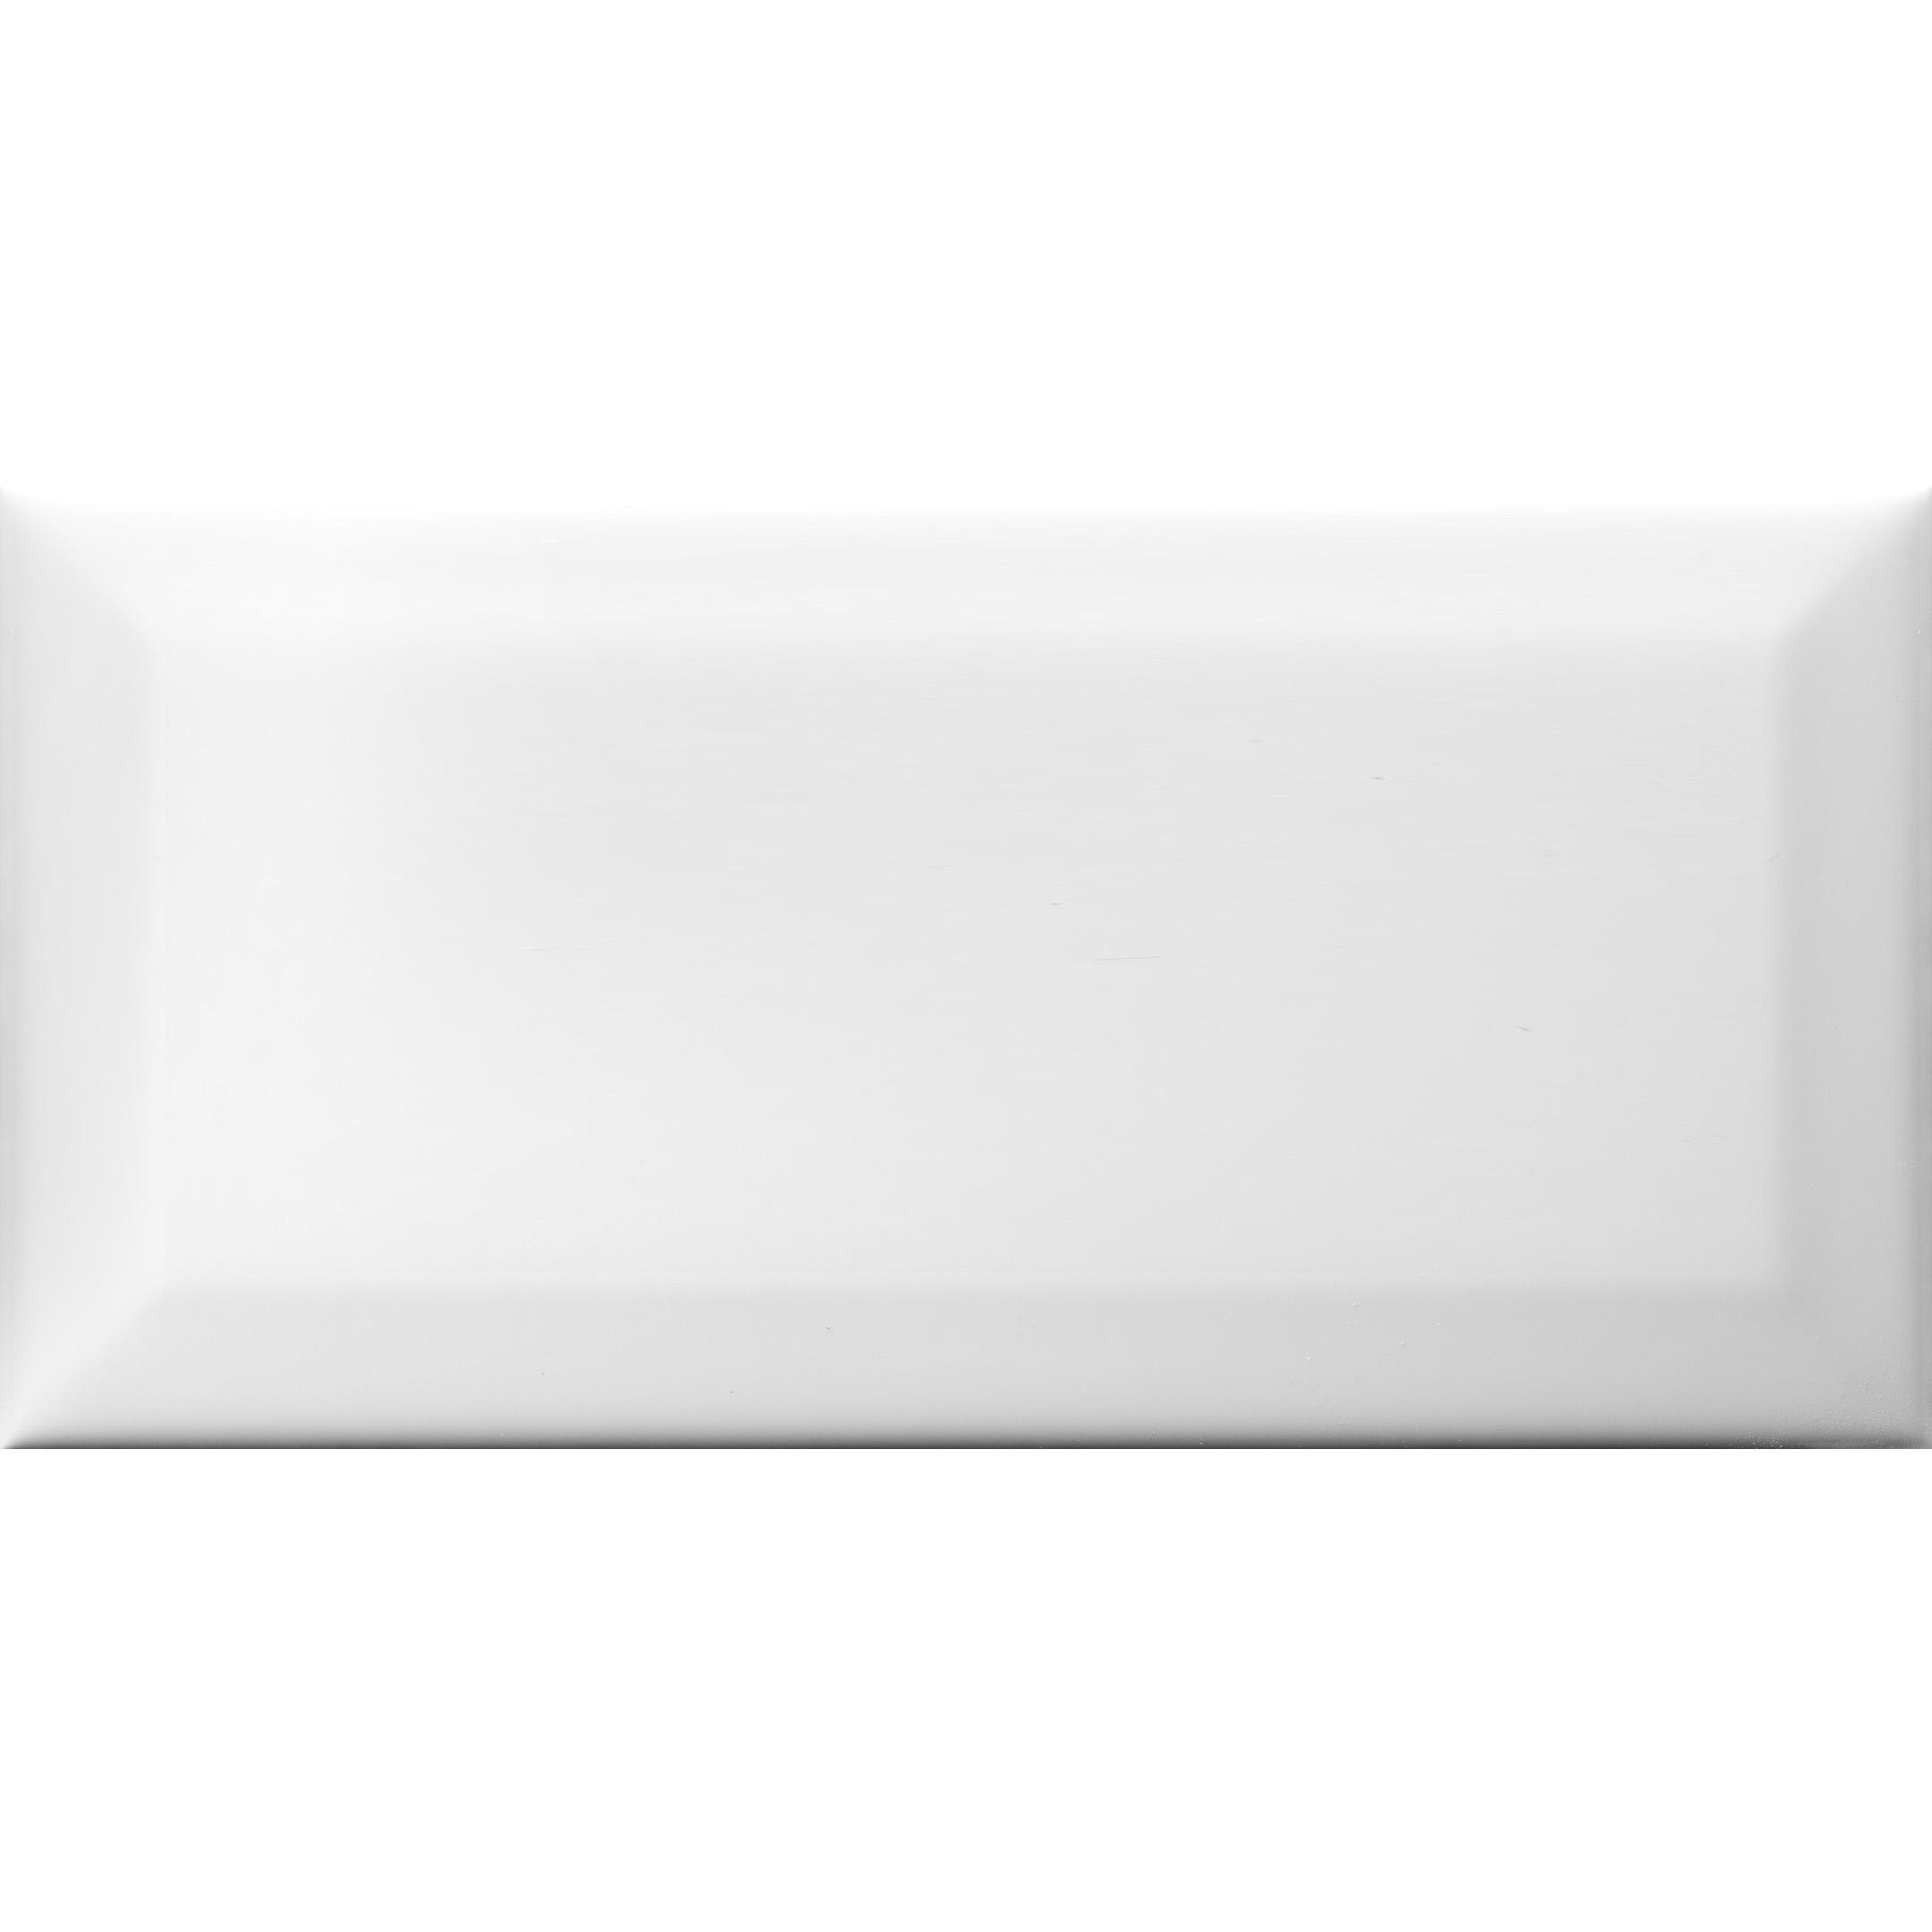 Плитка облицовочная Corsa Deco Cool Brick white 75x150x7,8 мм (136 шт.=1,53 кв.м)